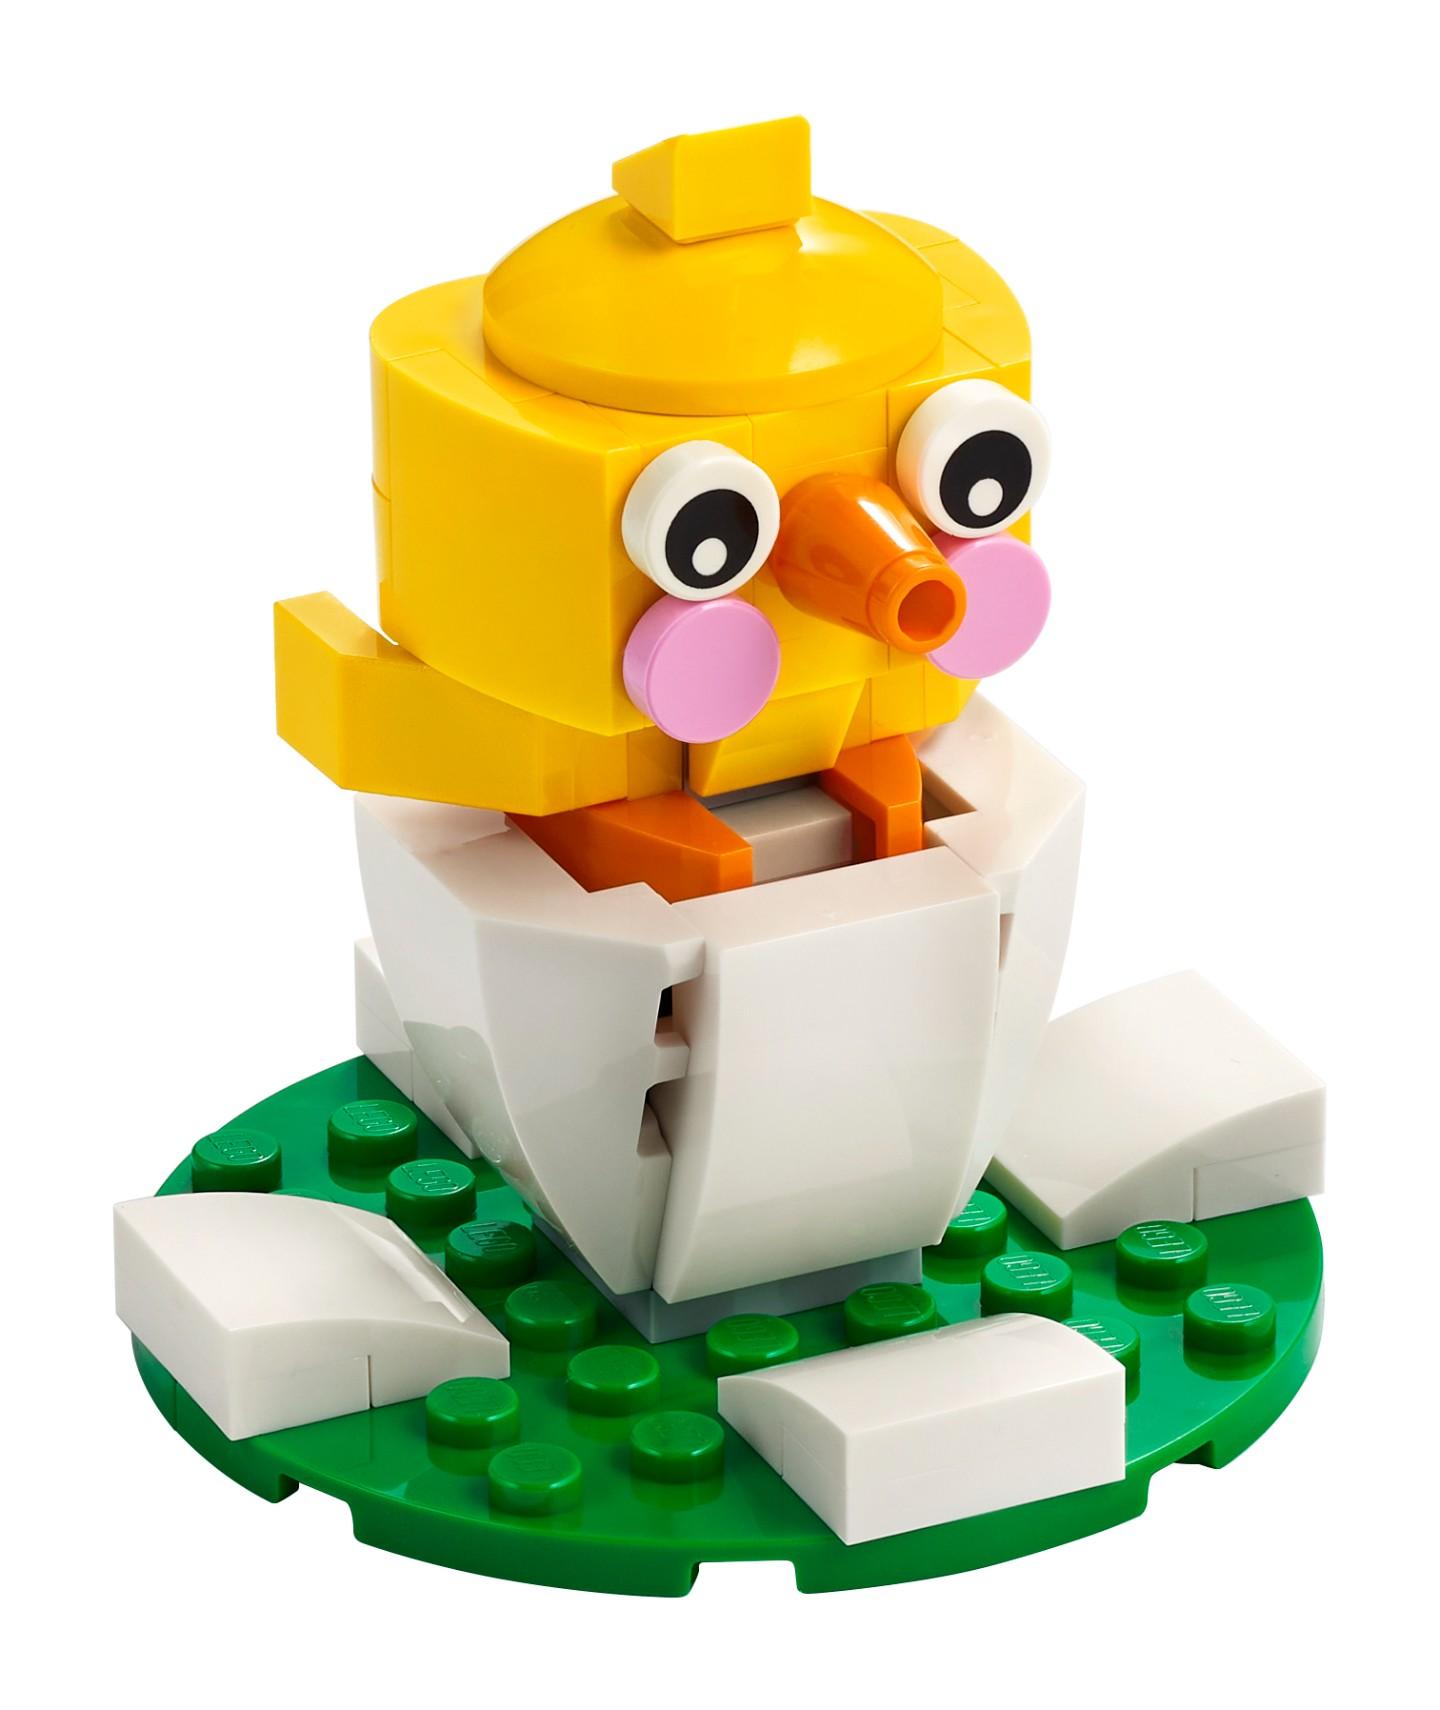 Easter Chick image 2.jpg